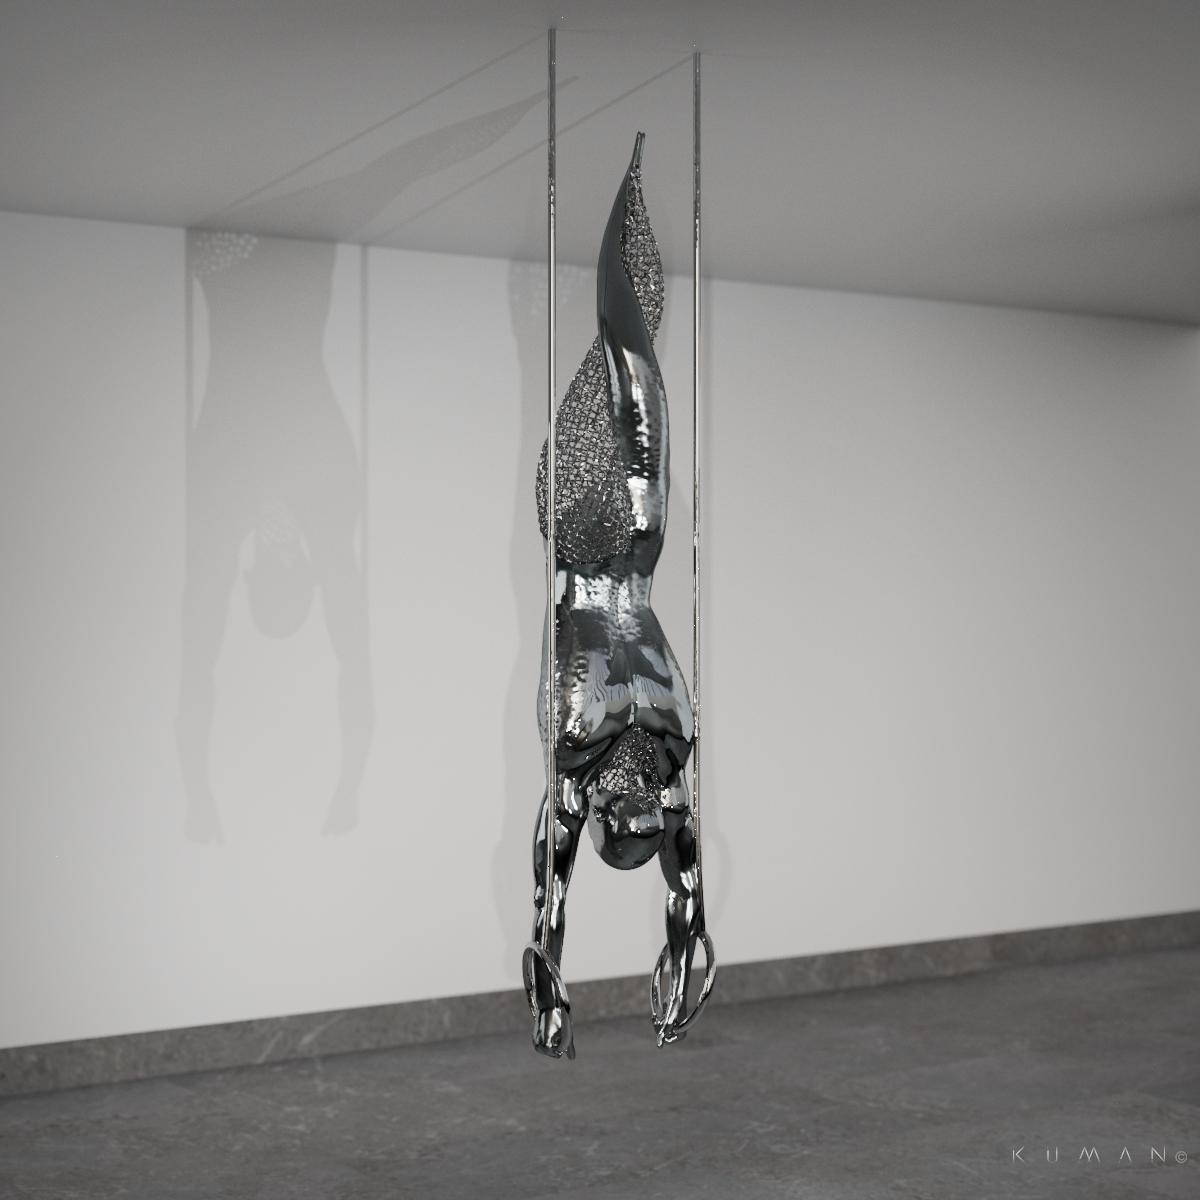 KUMAN | Œuvres d'art - L'acrobate